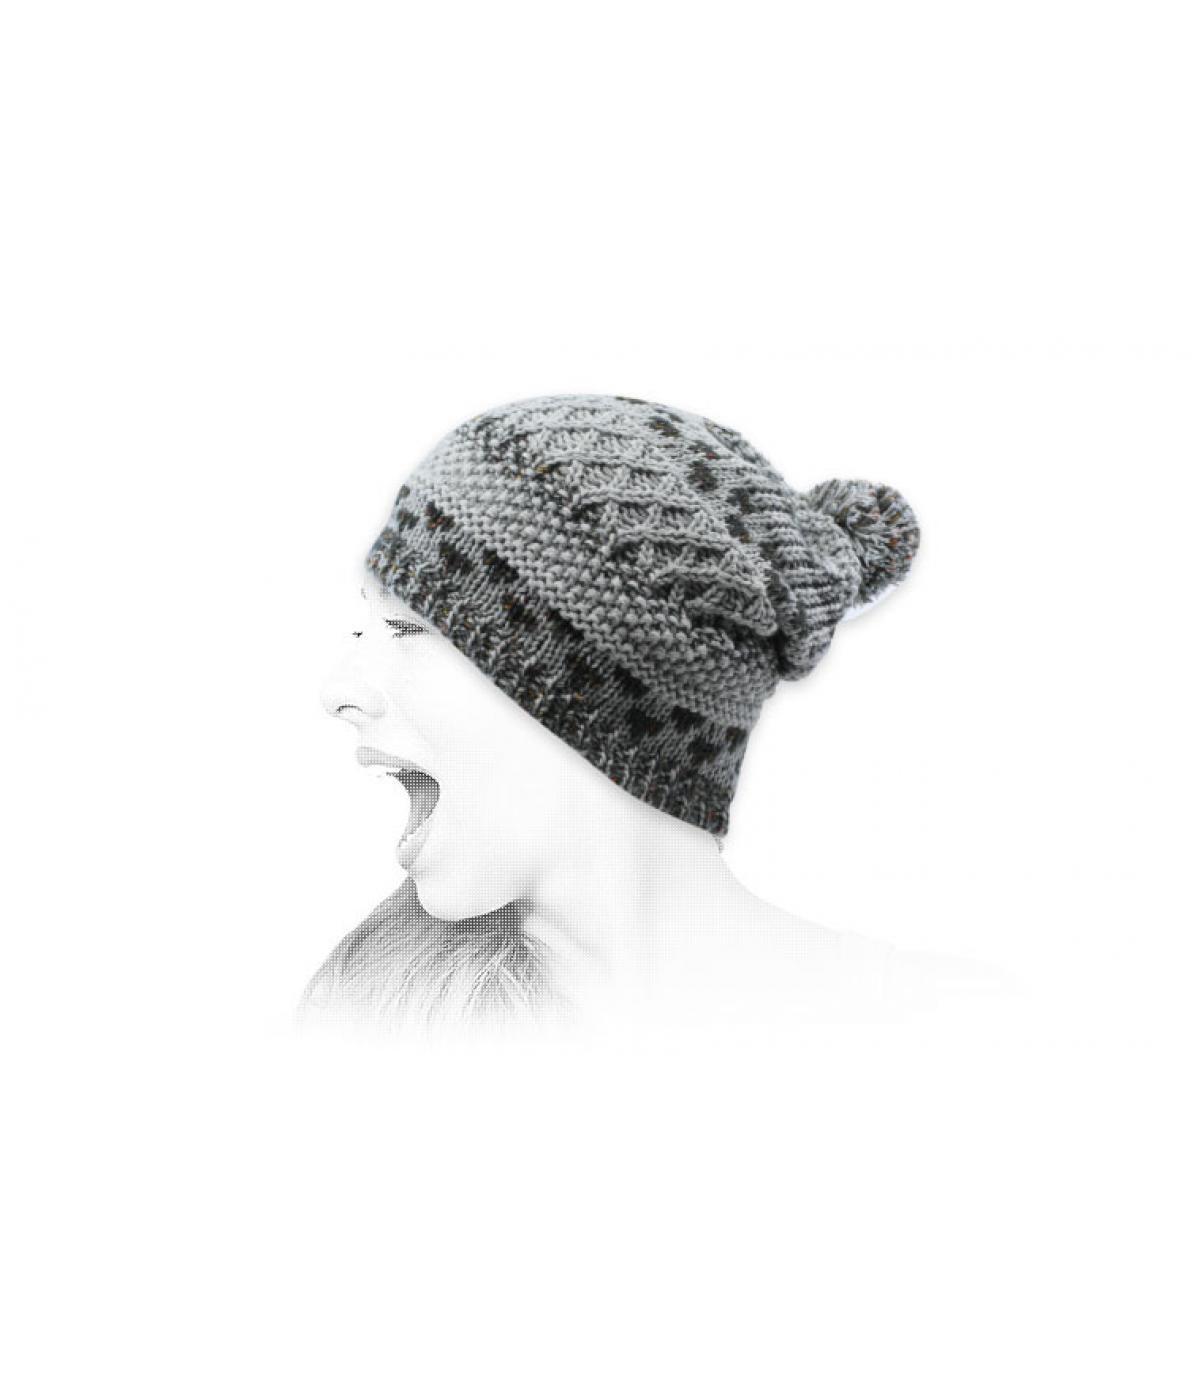 Bommel Mütze grau Jacquard